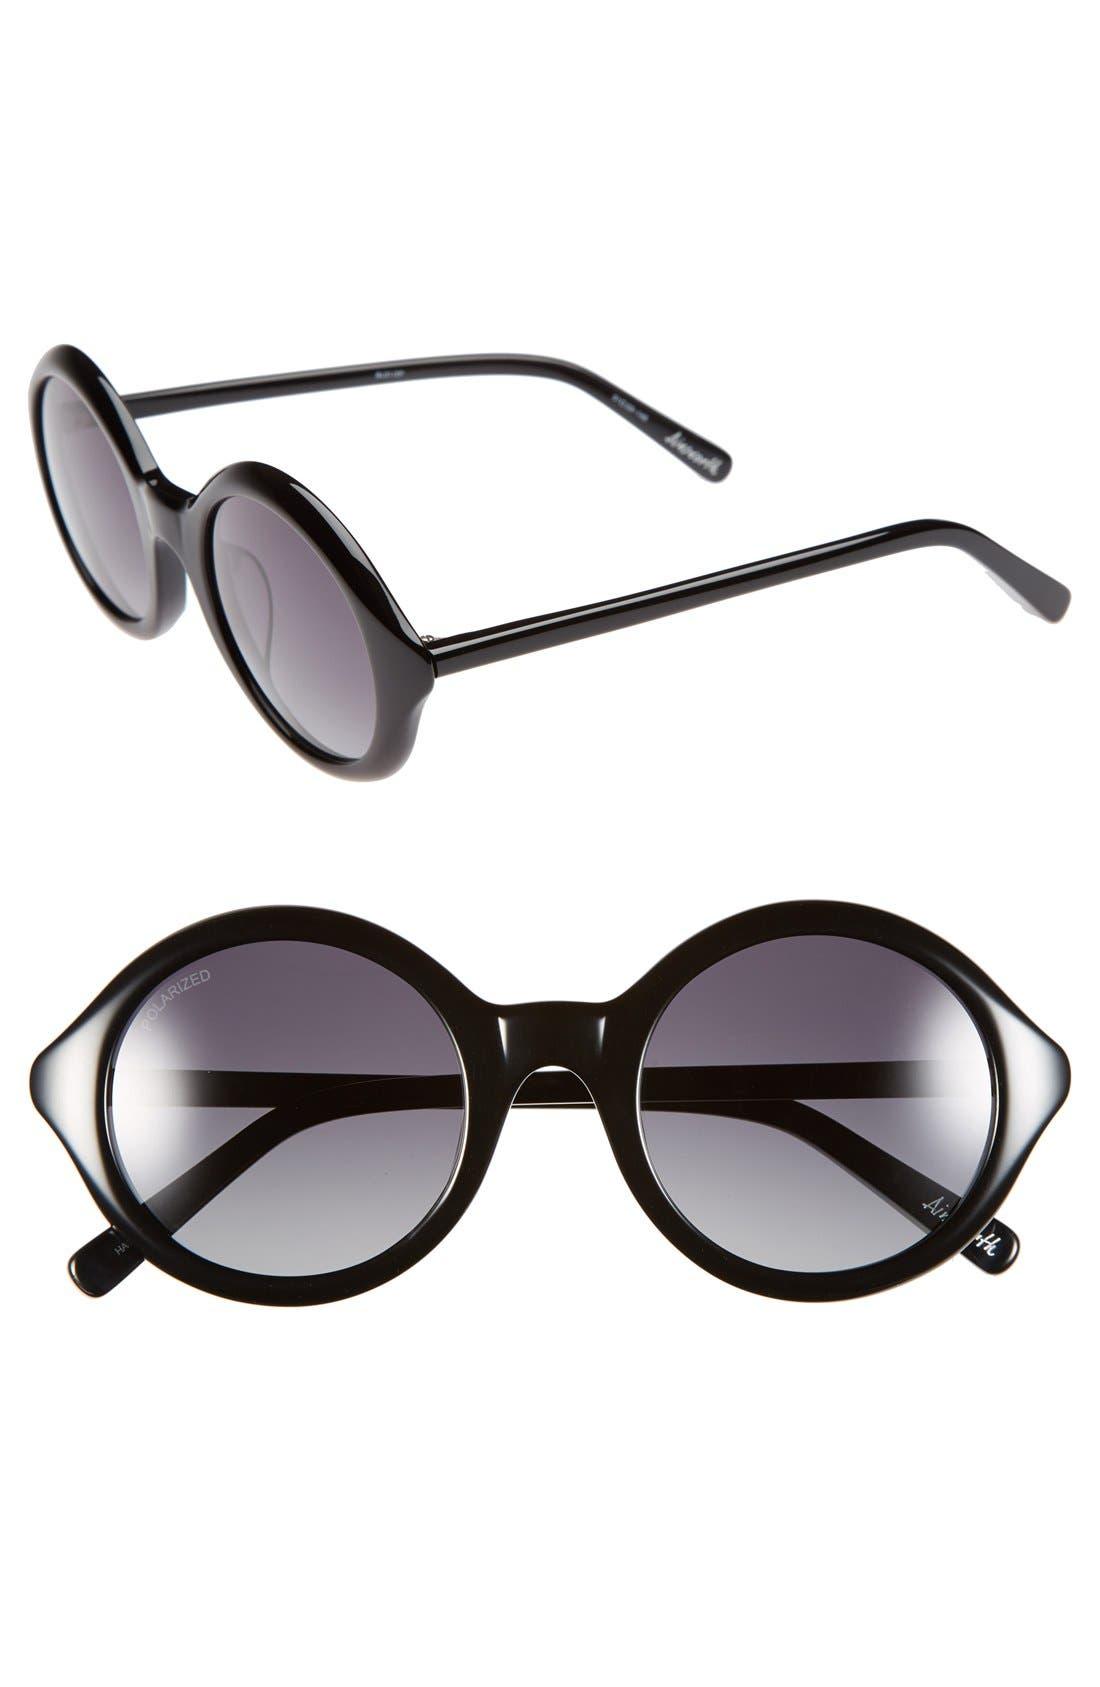 Alternate Image 1 Selected - Elizabeth and James 'Ainsworth' 51mm Polarized Sunglasses